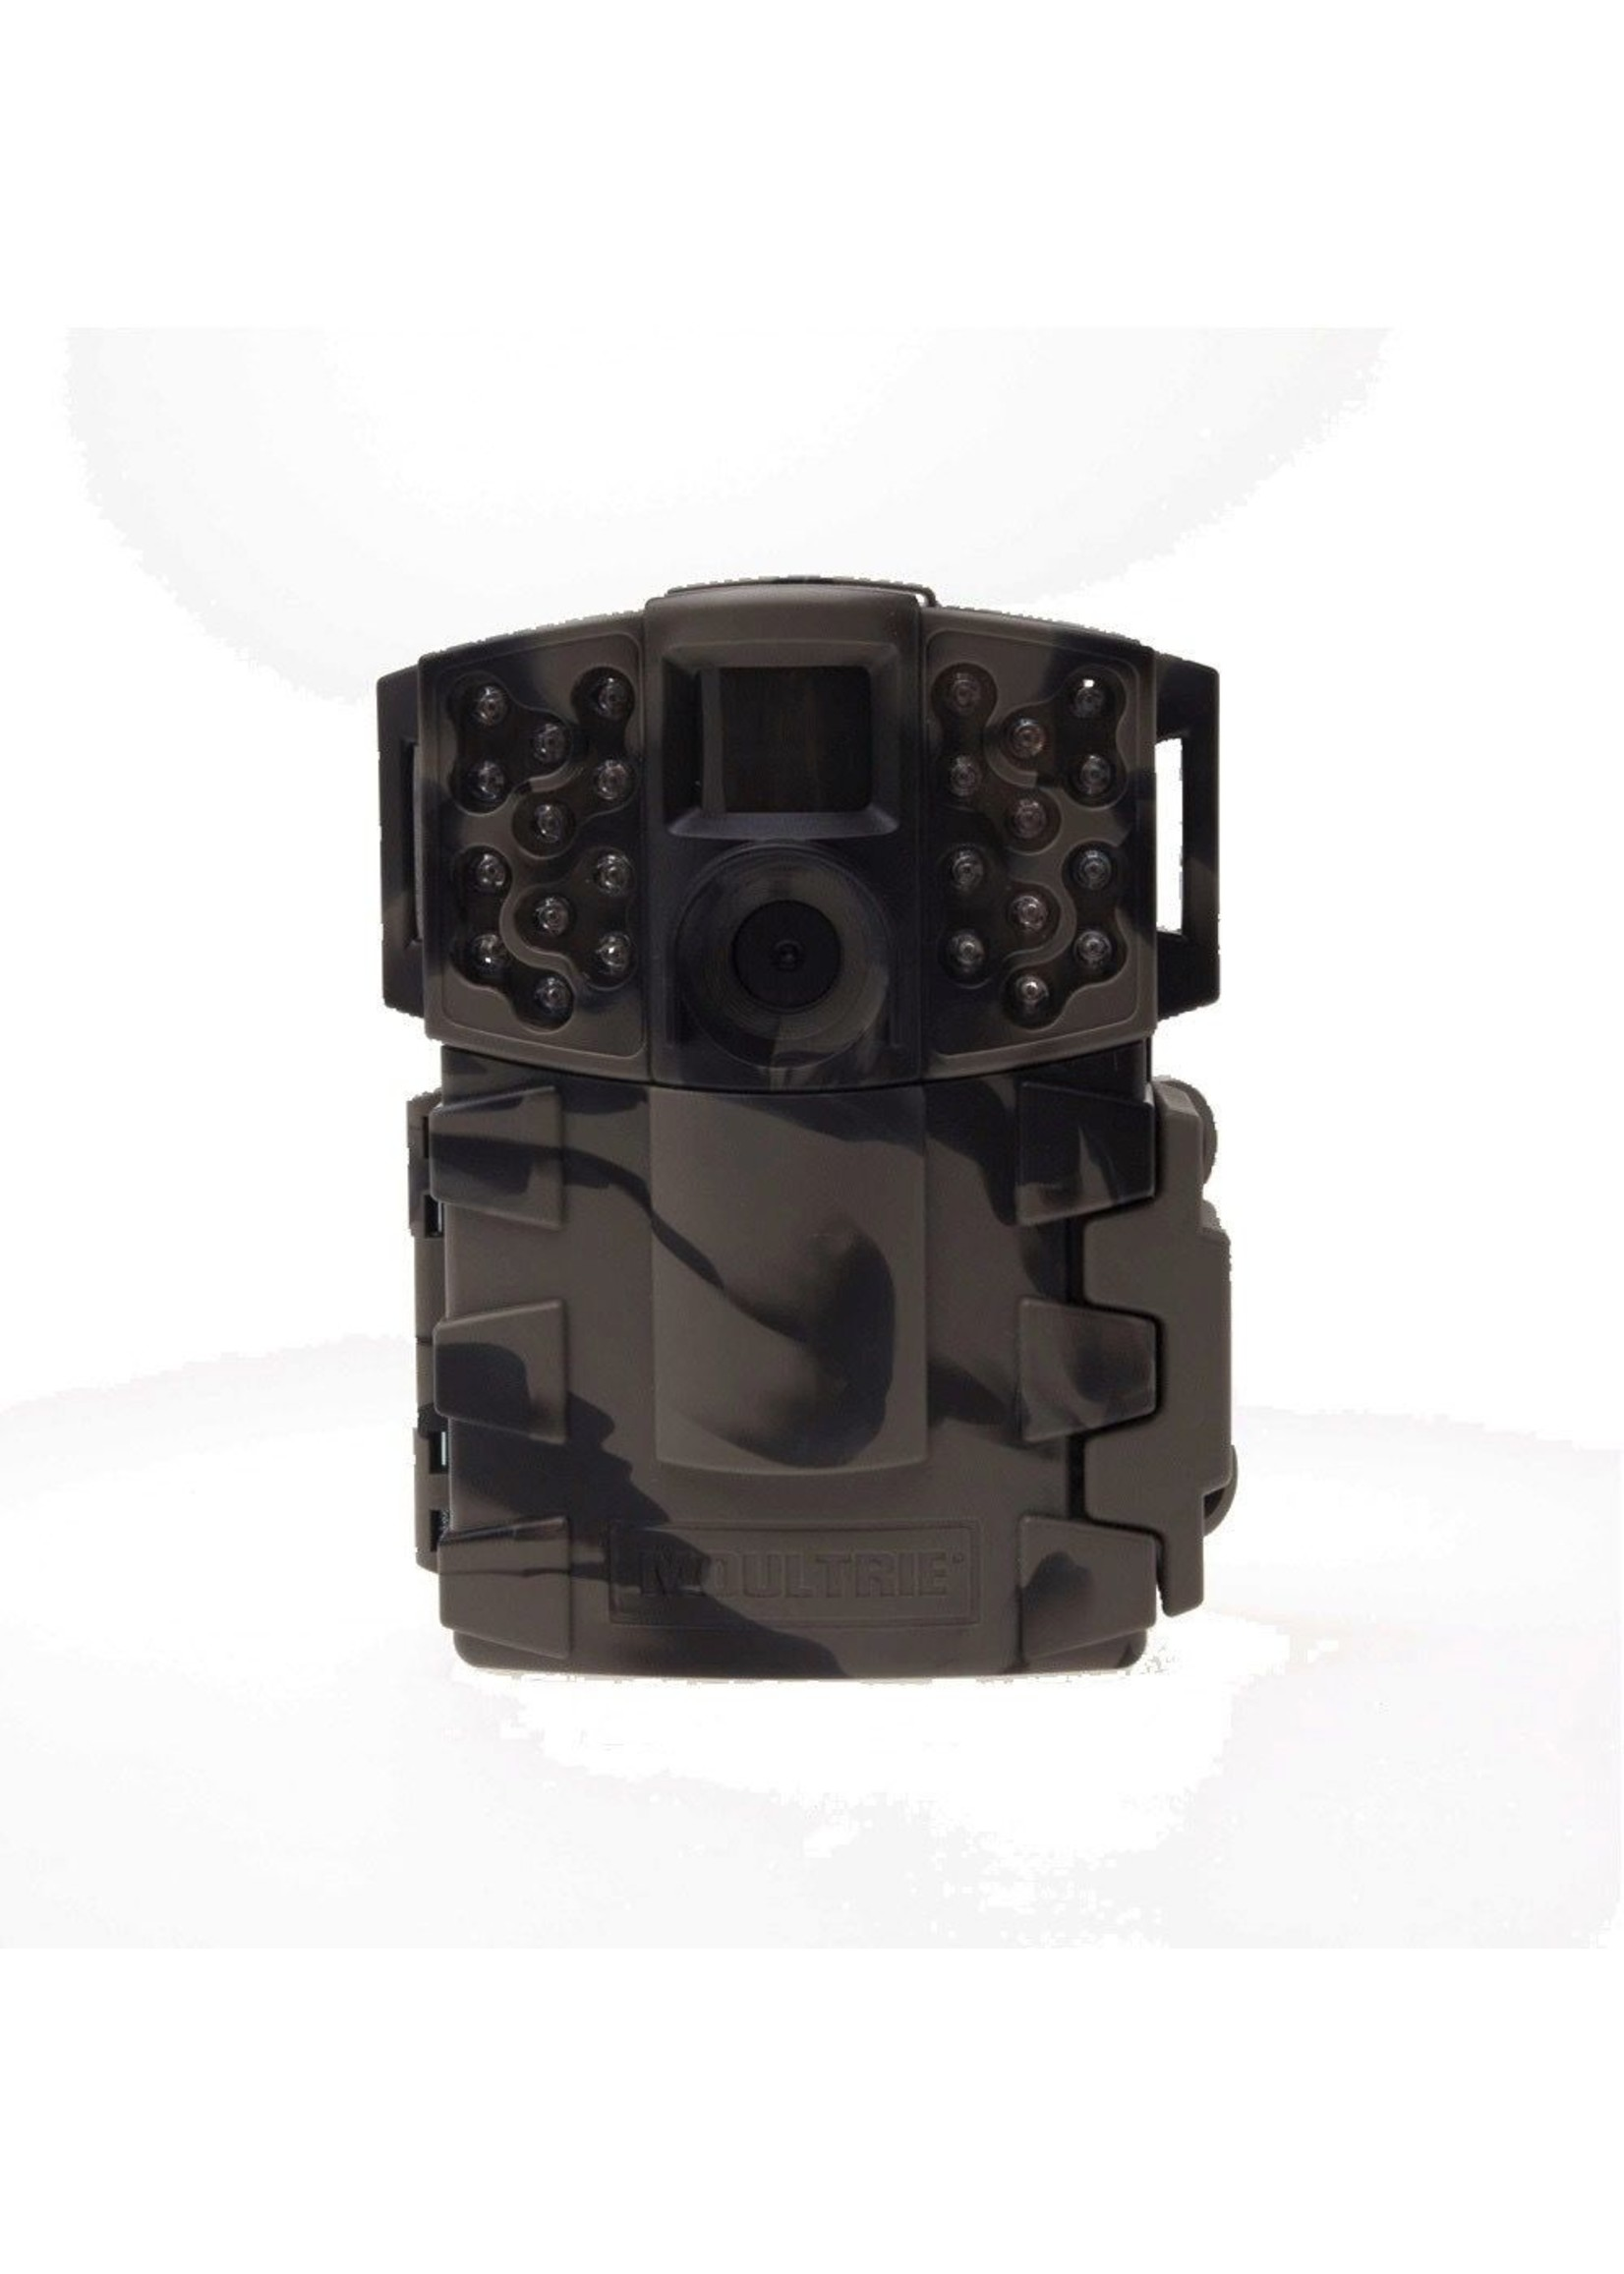 Moultrie Moultrie M-550 Gen2 Trail Camera